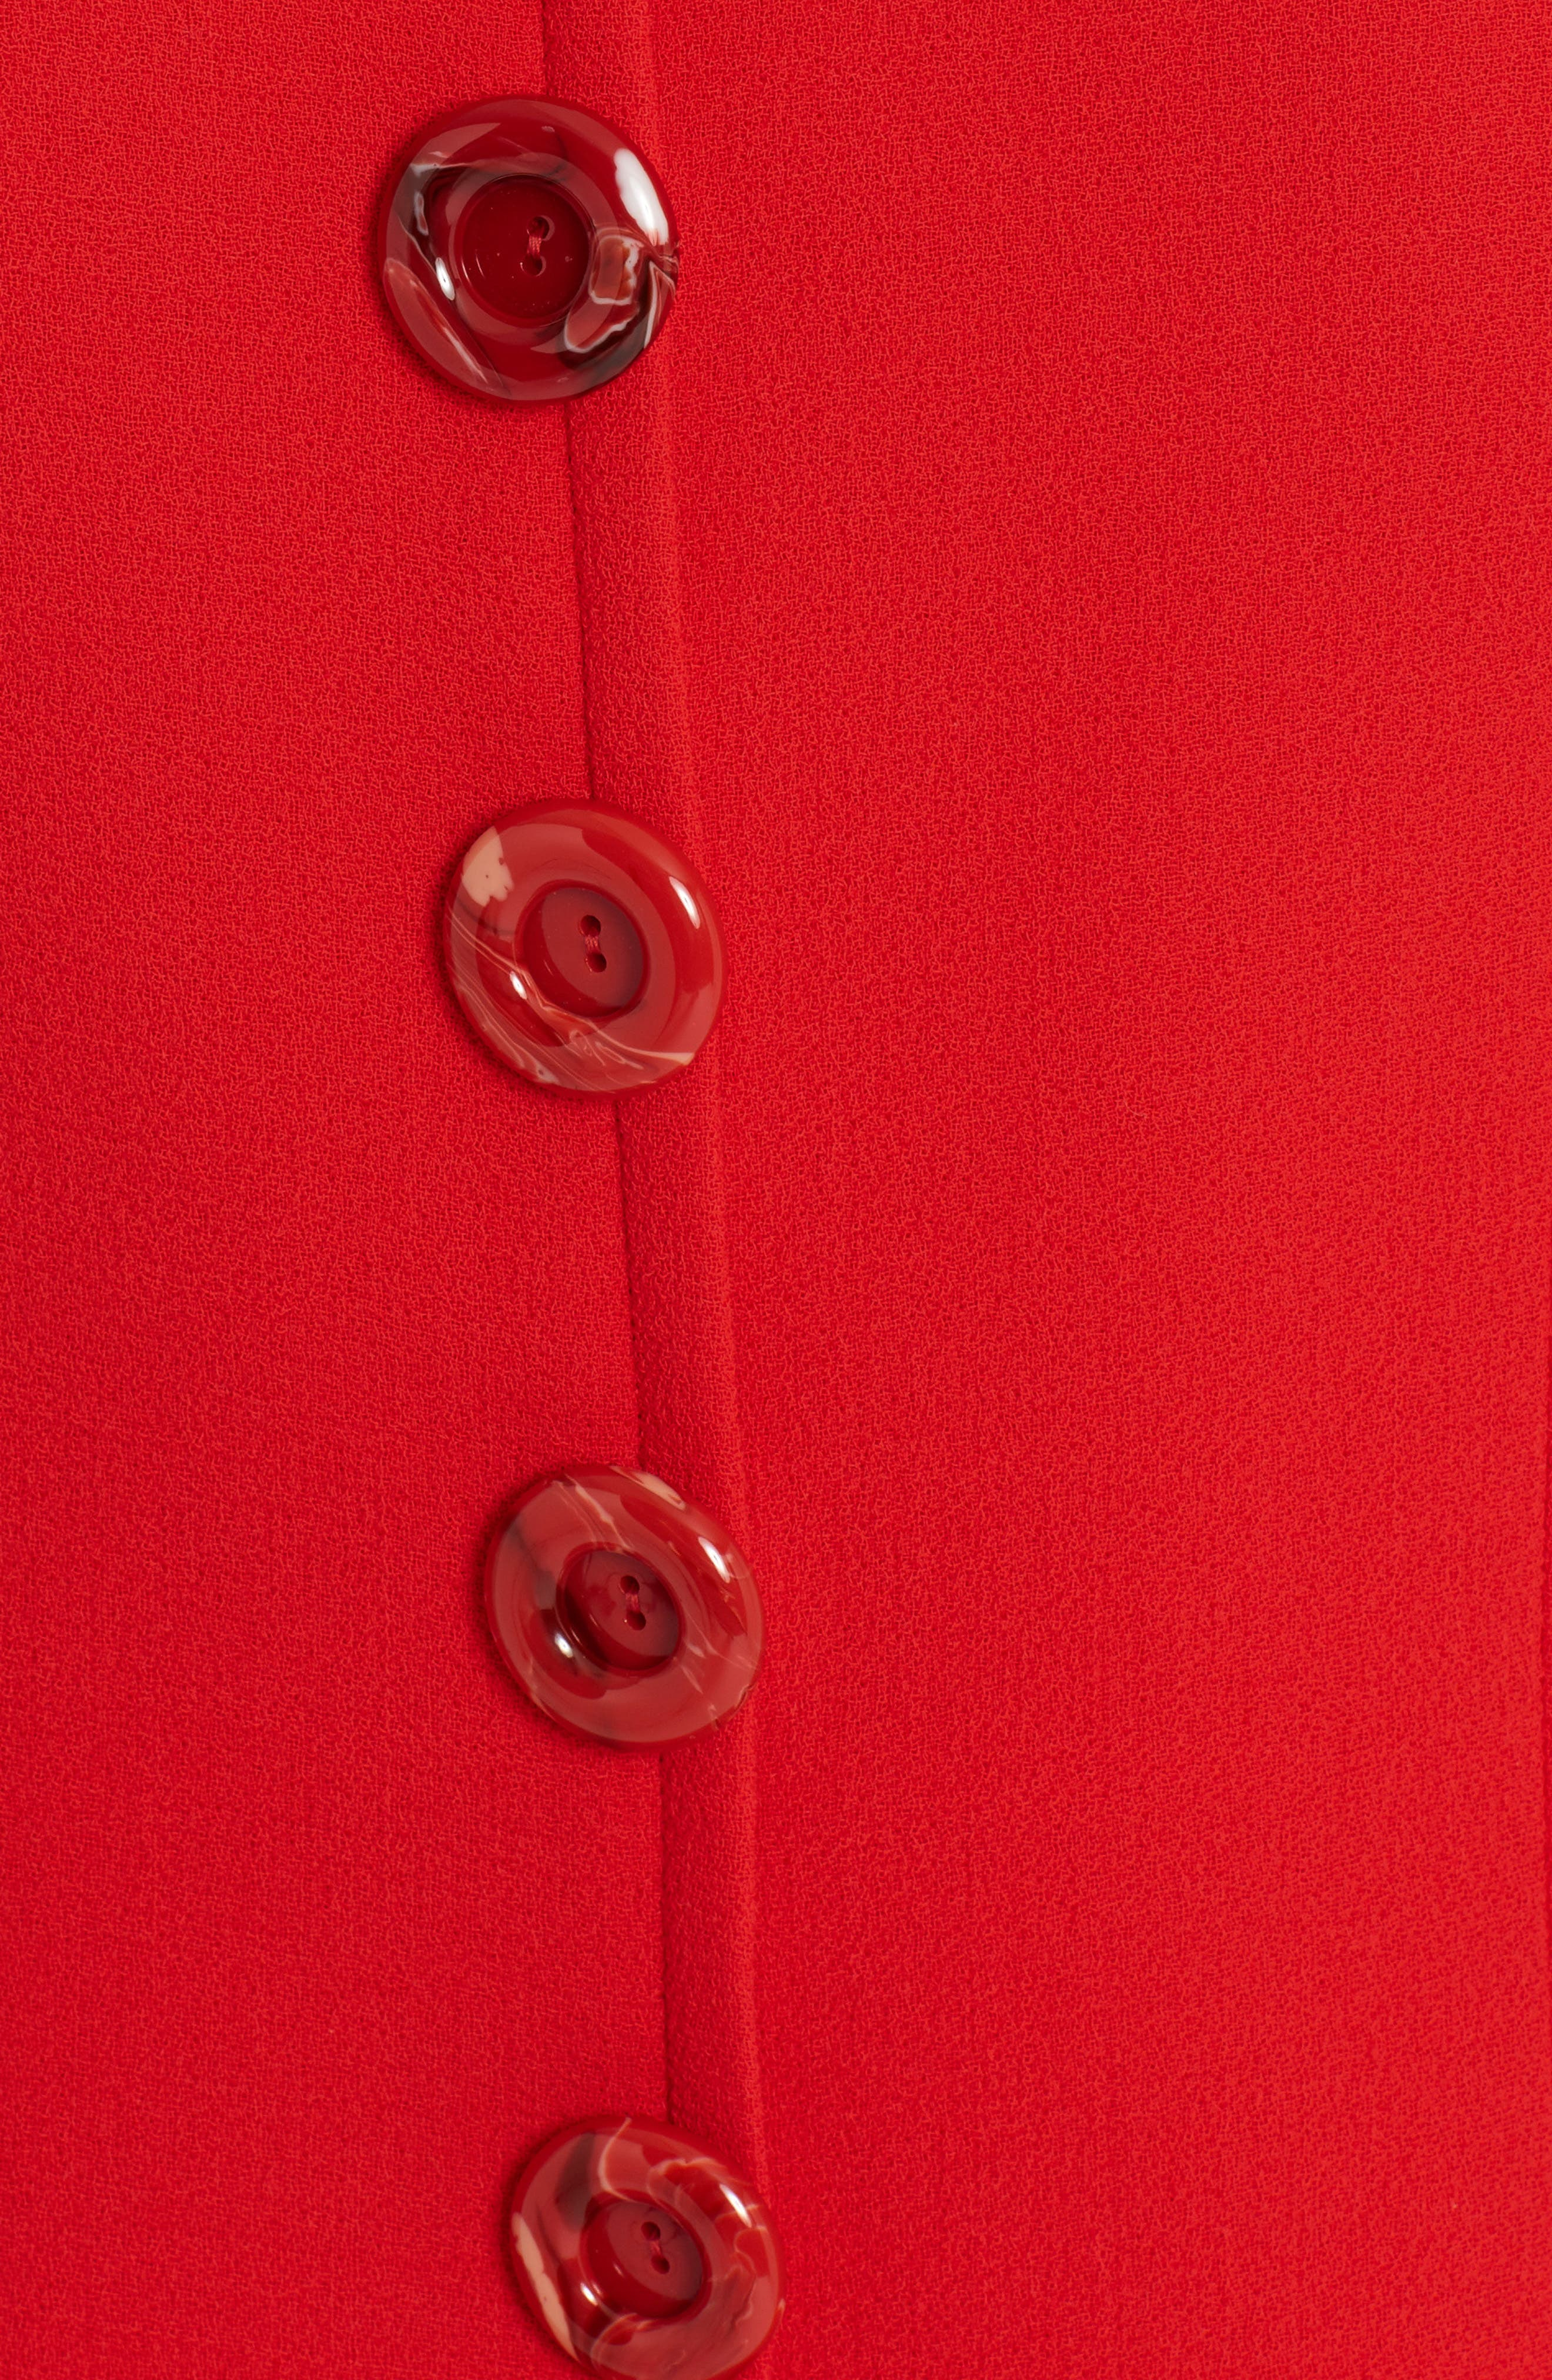 Crepe Shift Dress,                             Alternate thumbnail 5, color,                             Red